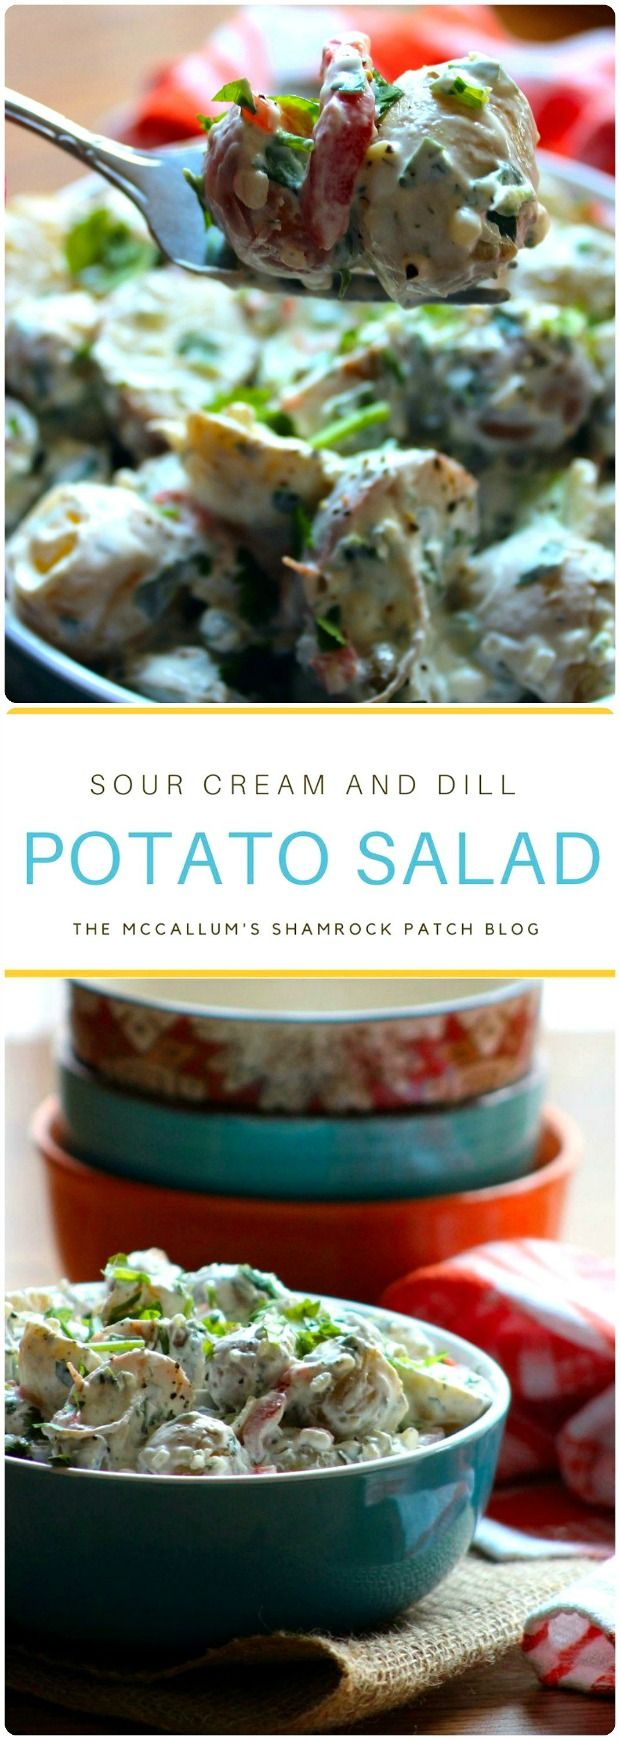 Sour Cream and Dill Potato Salad